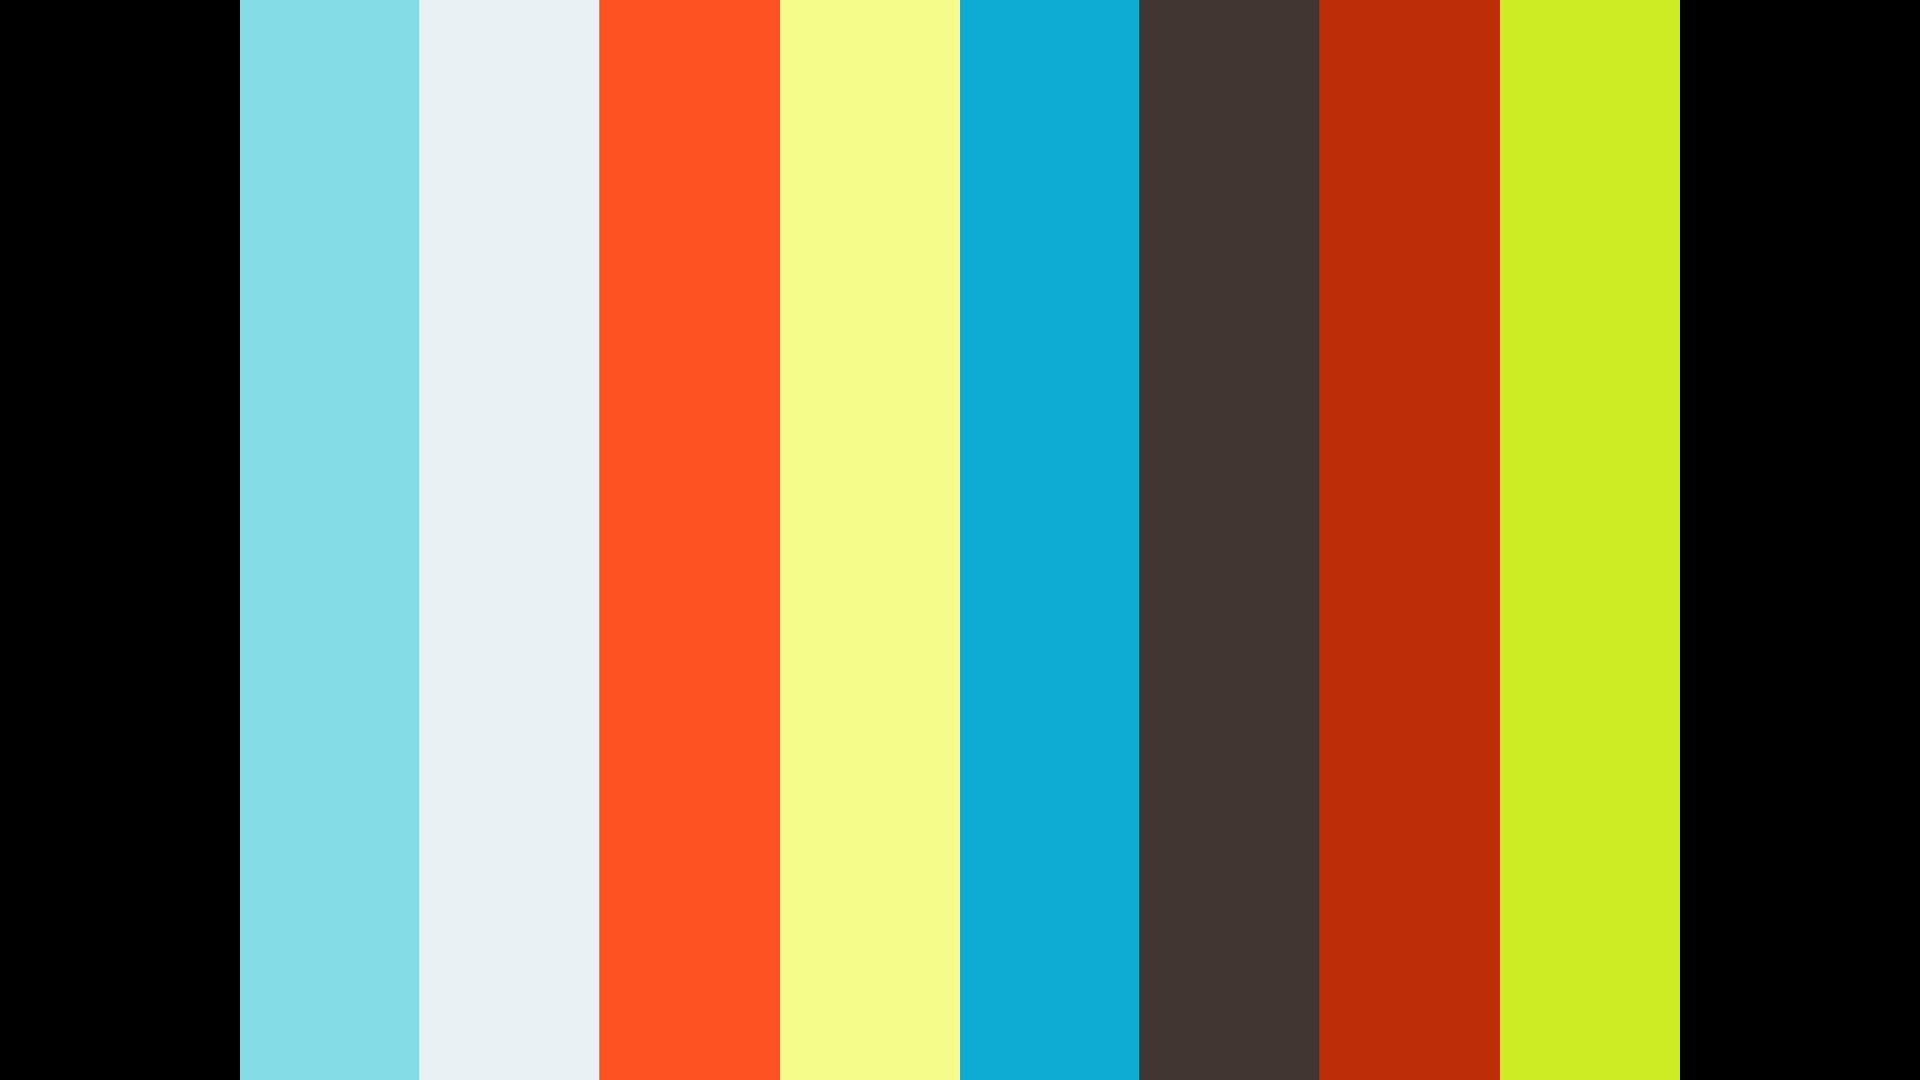 JASI-2020-PRELIM-Class A Small Mixed Division